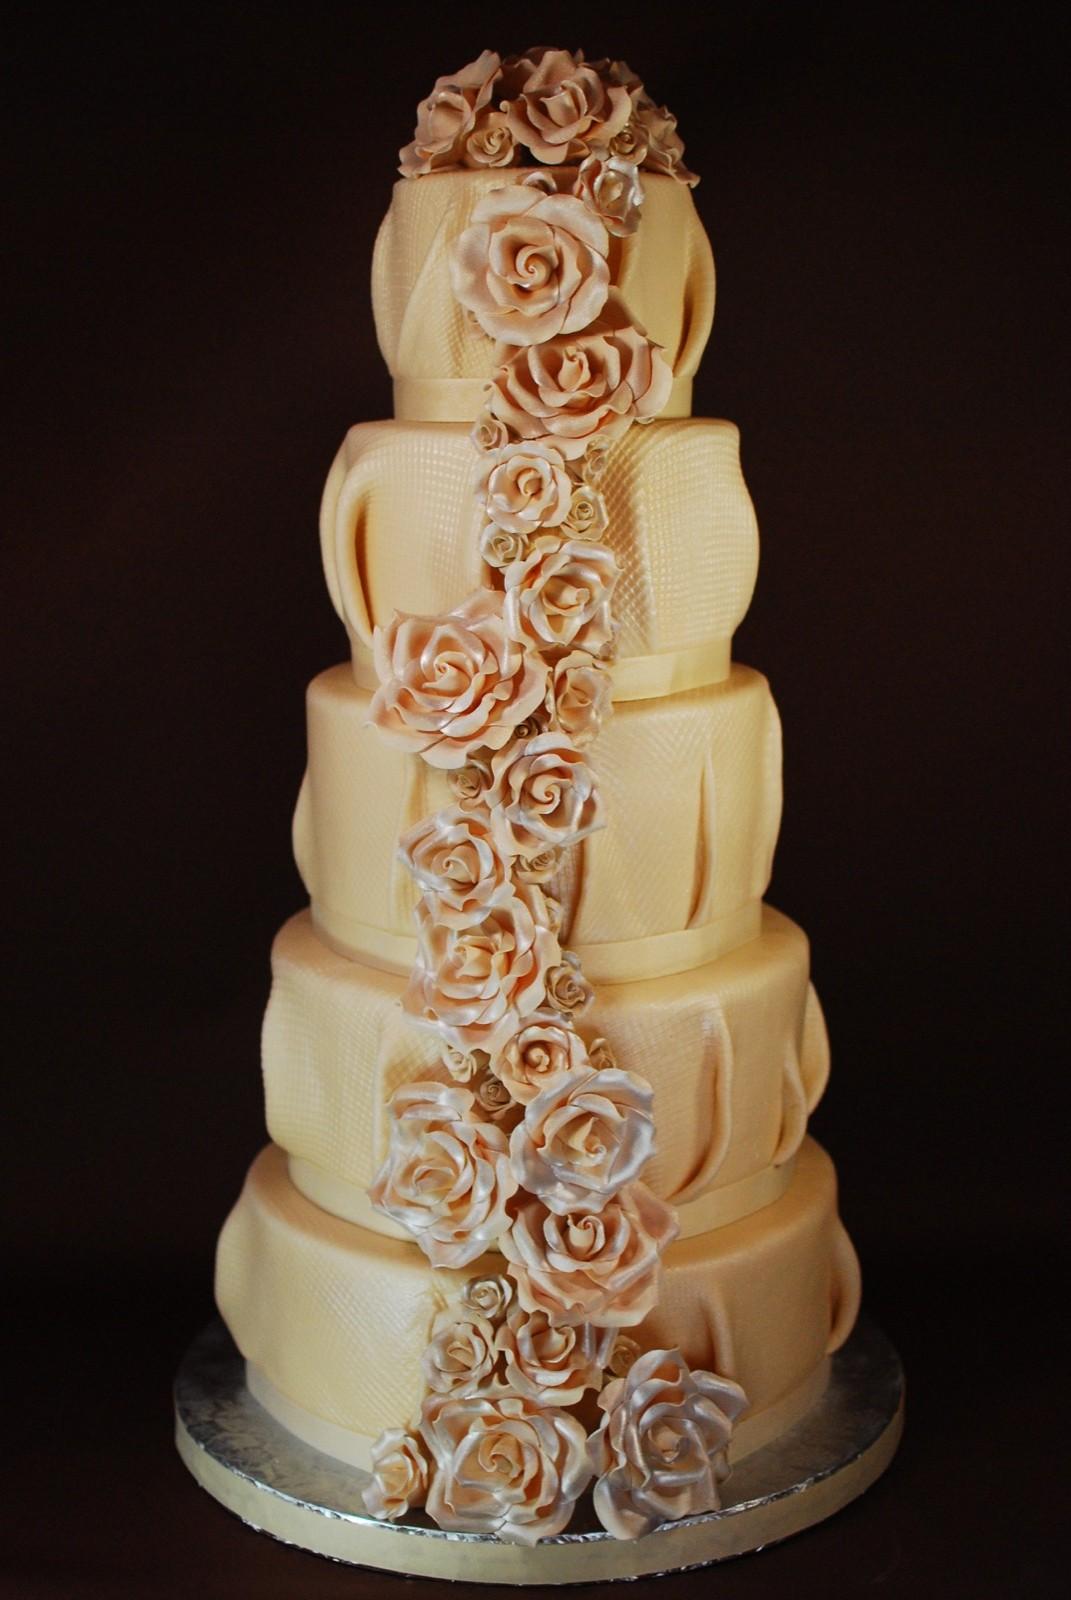 Burlap Wedding Cake with Roses